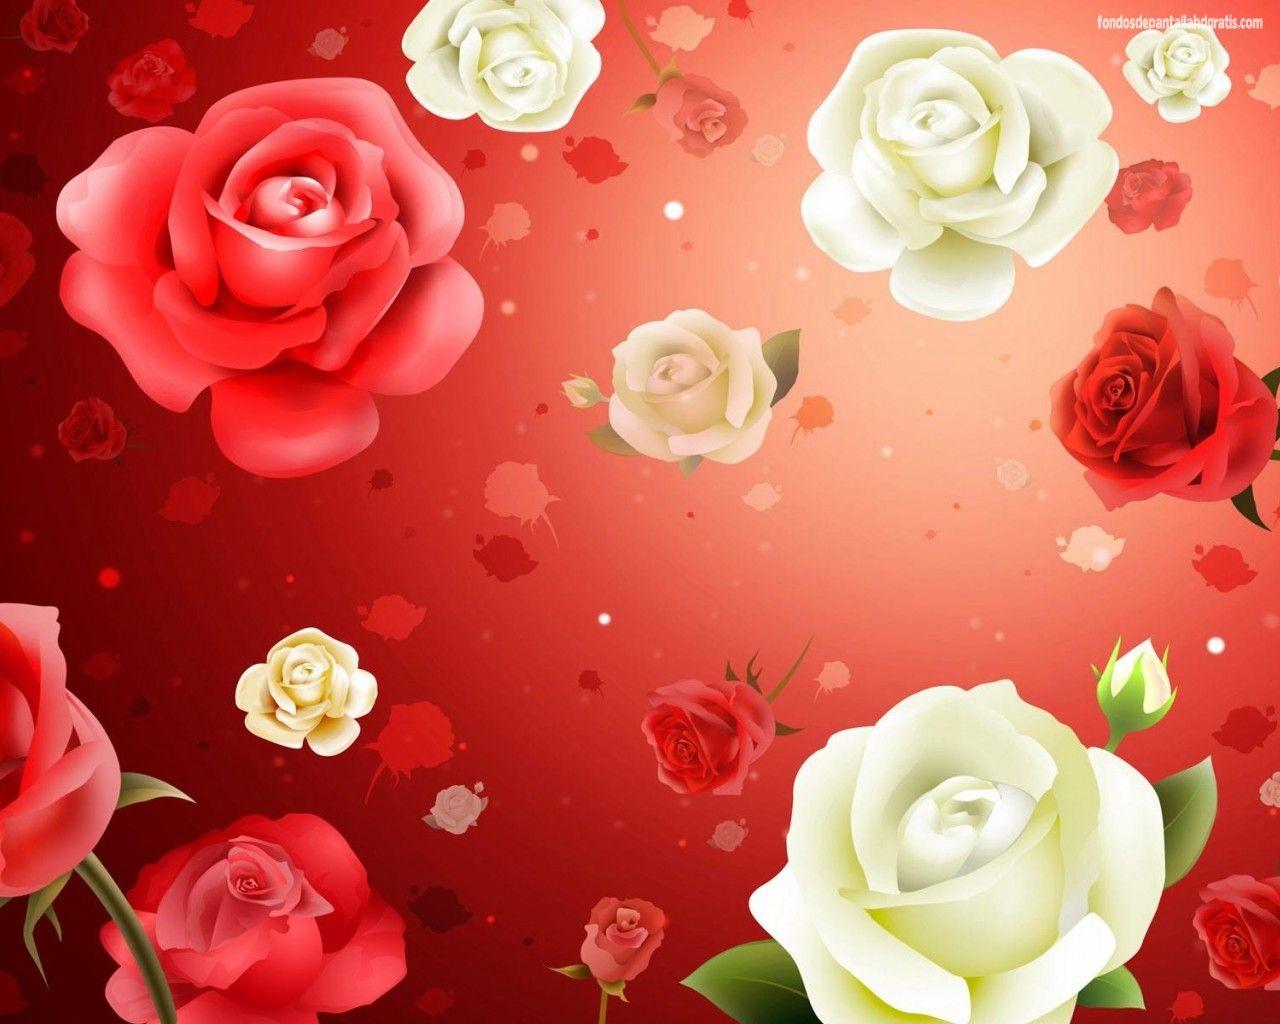 Fondos De Flores Wallpapers Hd Gratis: Fondos De Flores Gratis Para Protector De Pantalla 12 HD